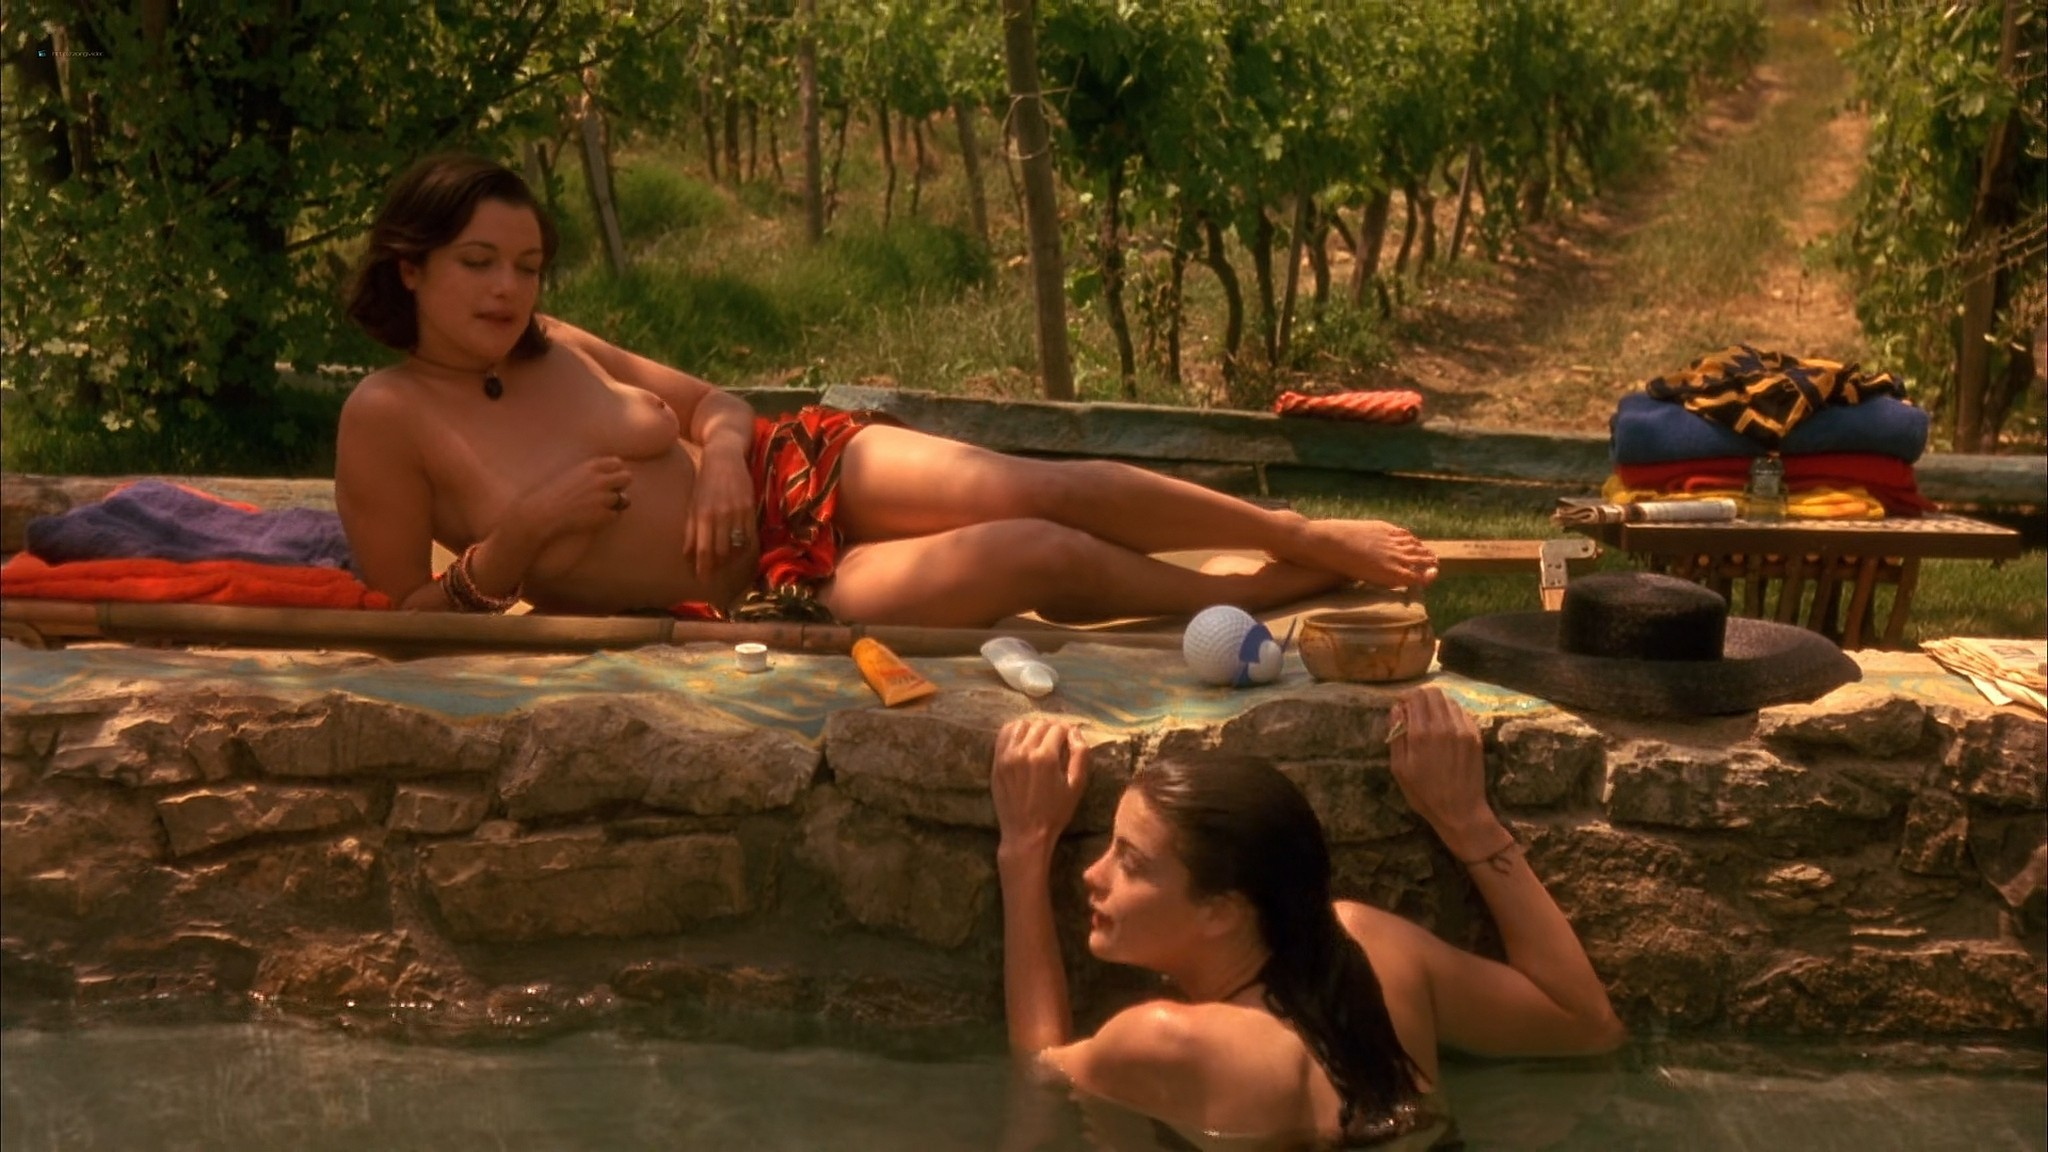 Liv Tyler nude Rachel Weisz Sinead Cusack nude and hot Stealing Beauty 1996 1080p Web 6